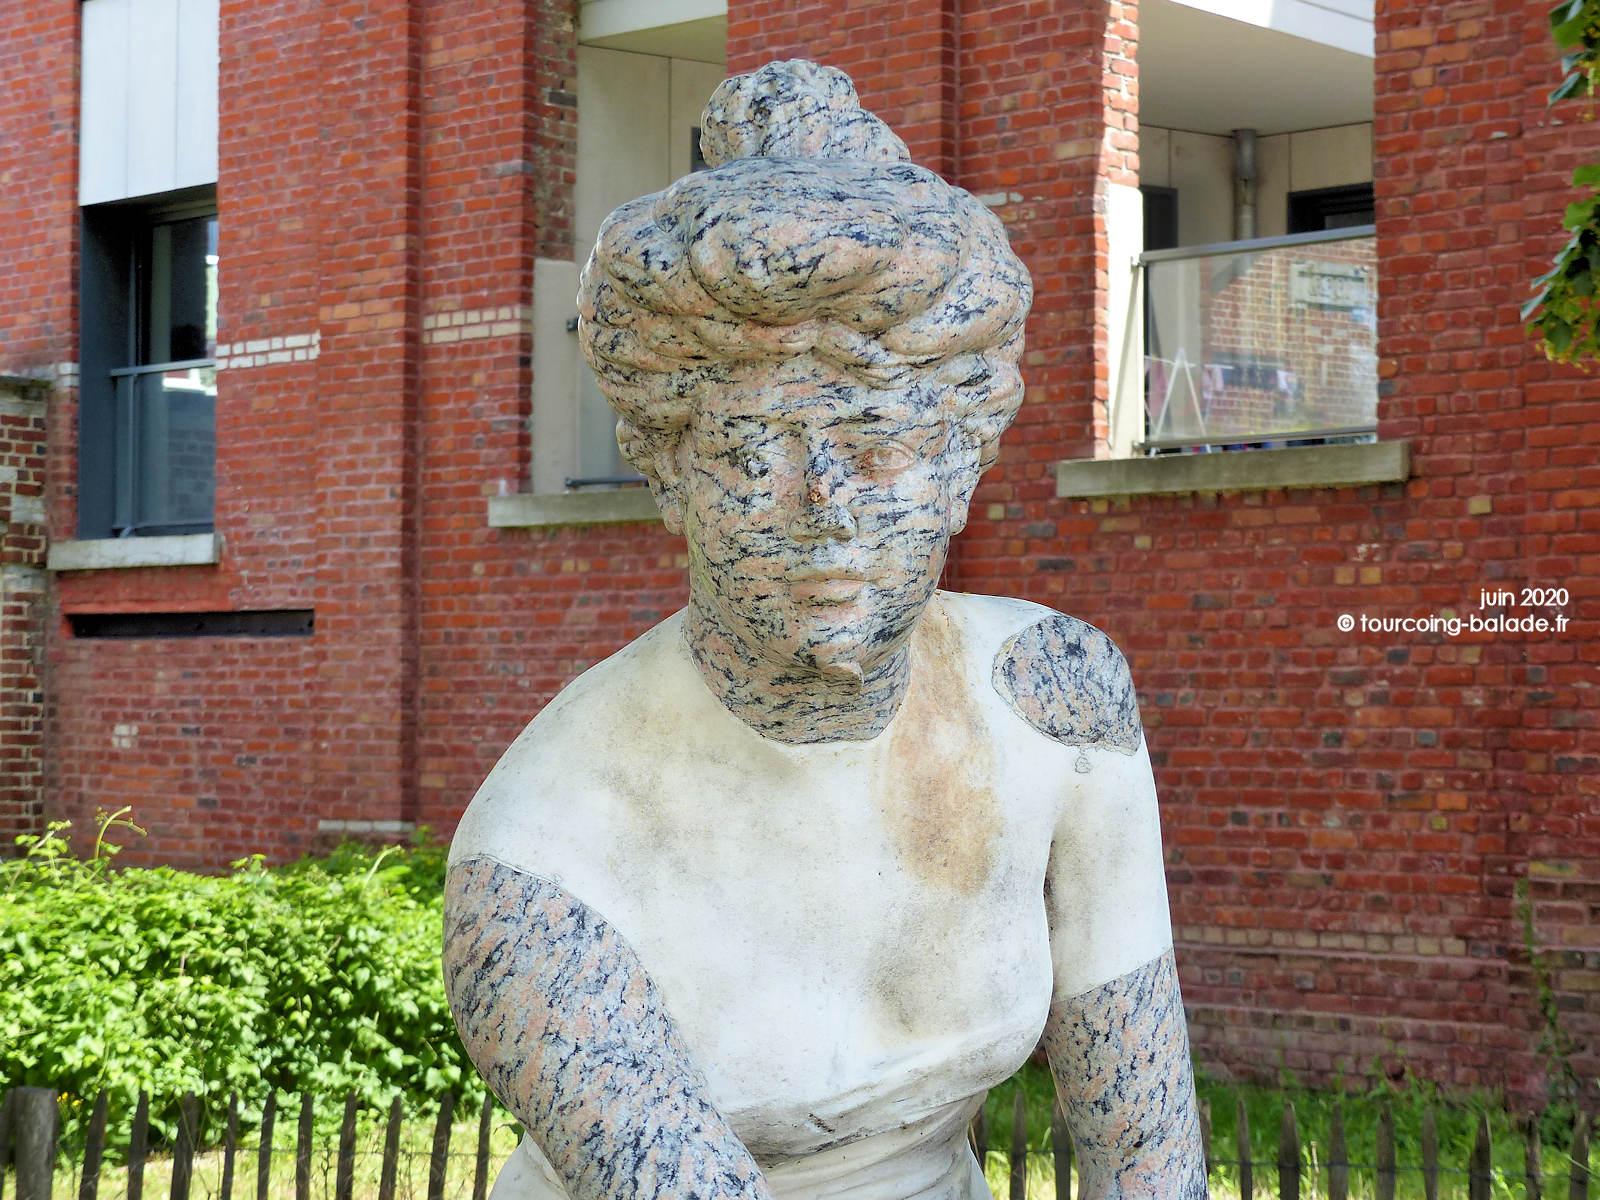 Statue La Penseuse, Tourcoing Belencontre 2020